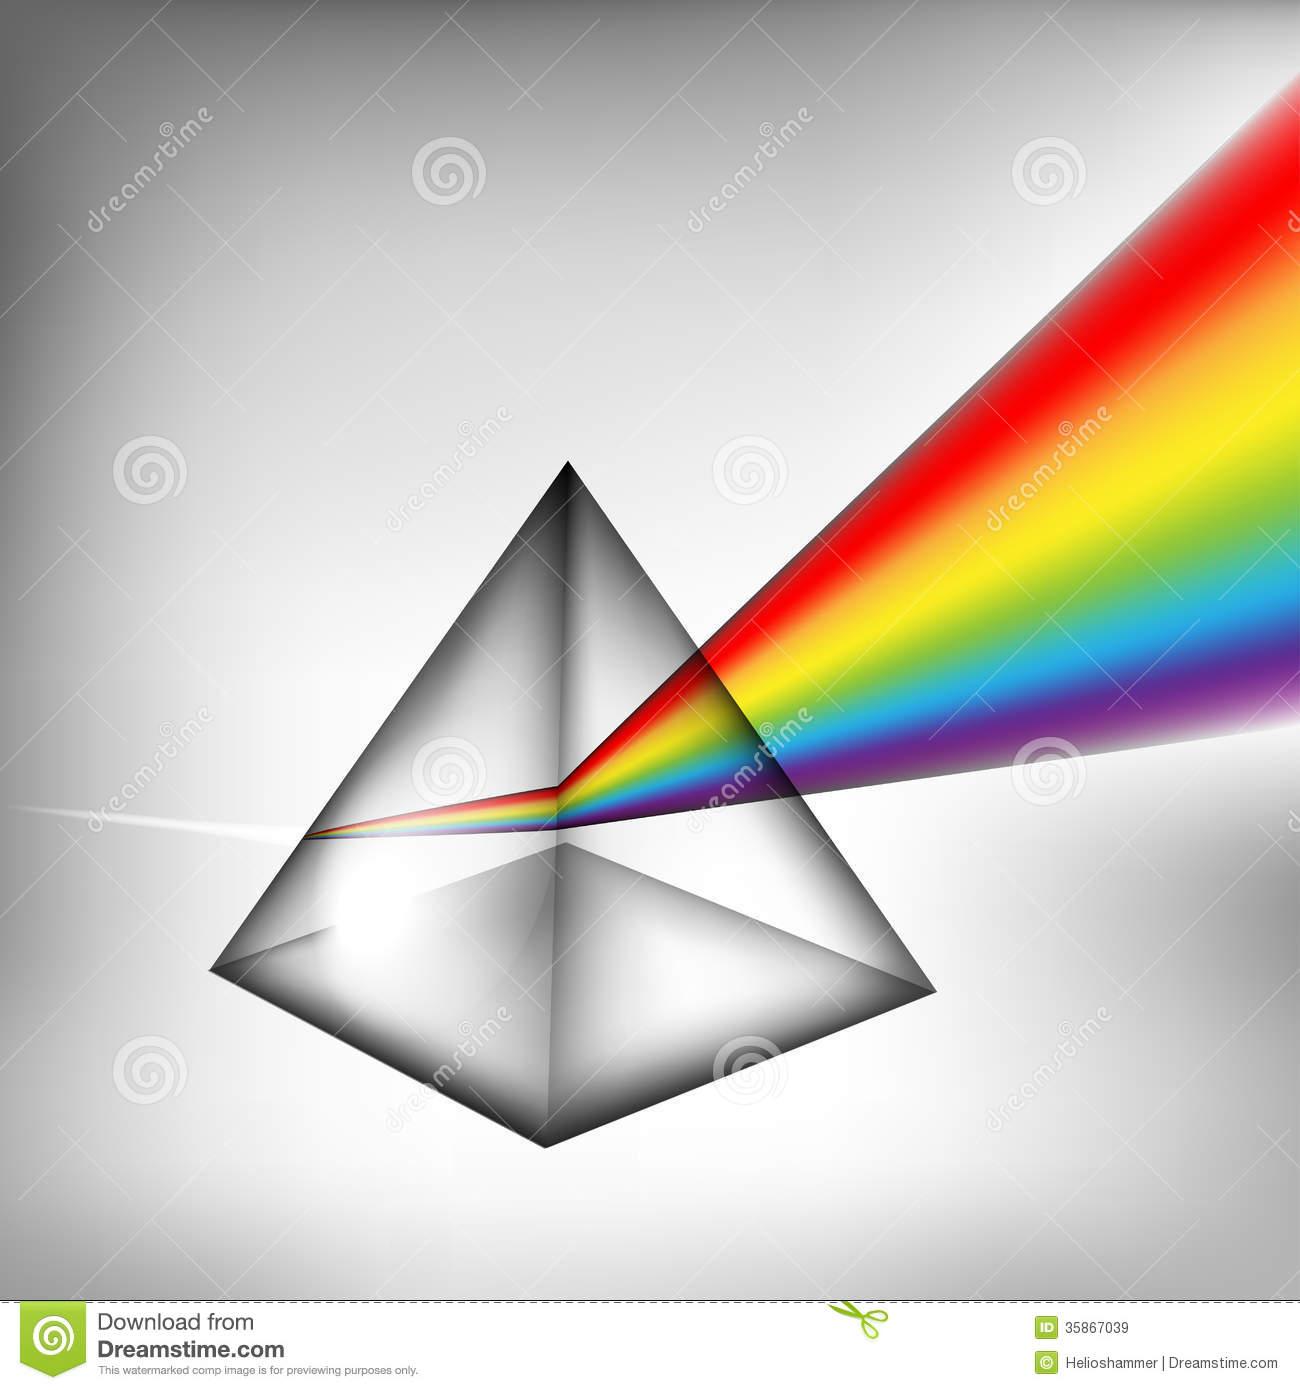 1300x1390 Prism 20clipart Clipart Panda